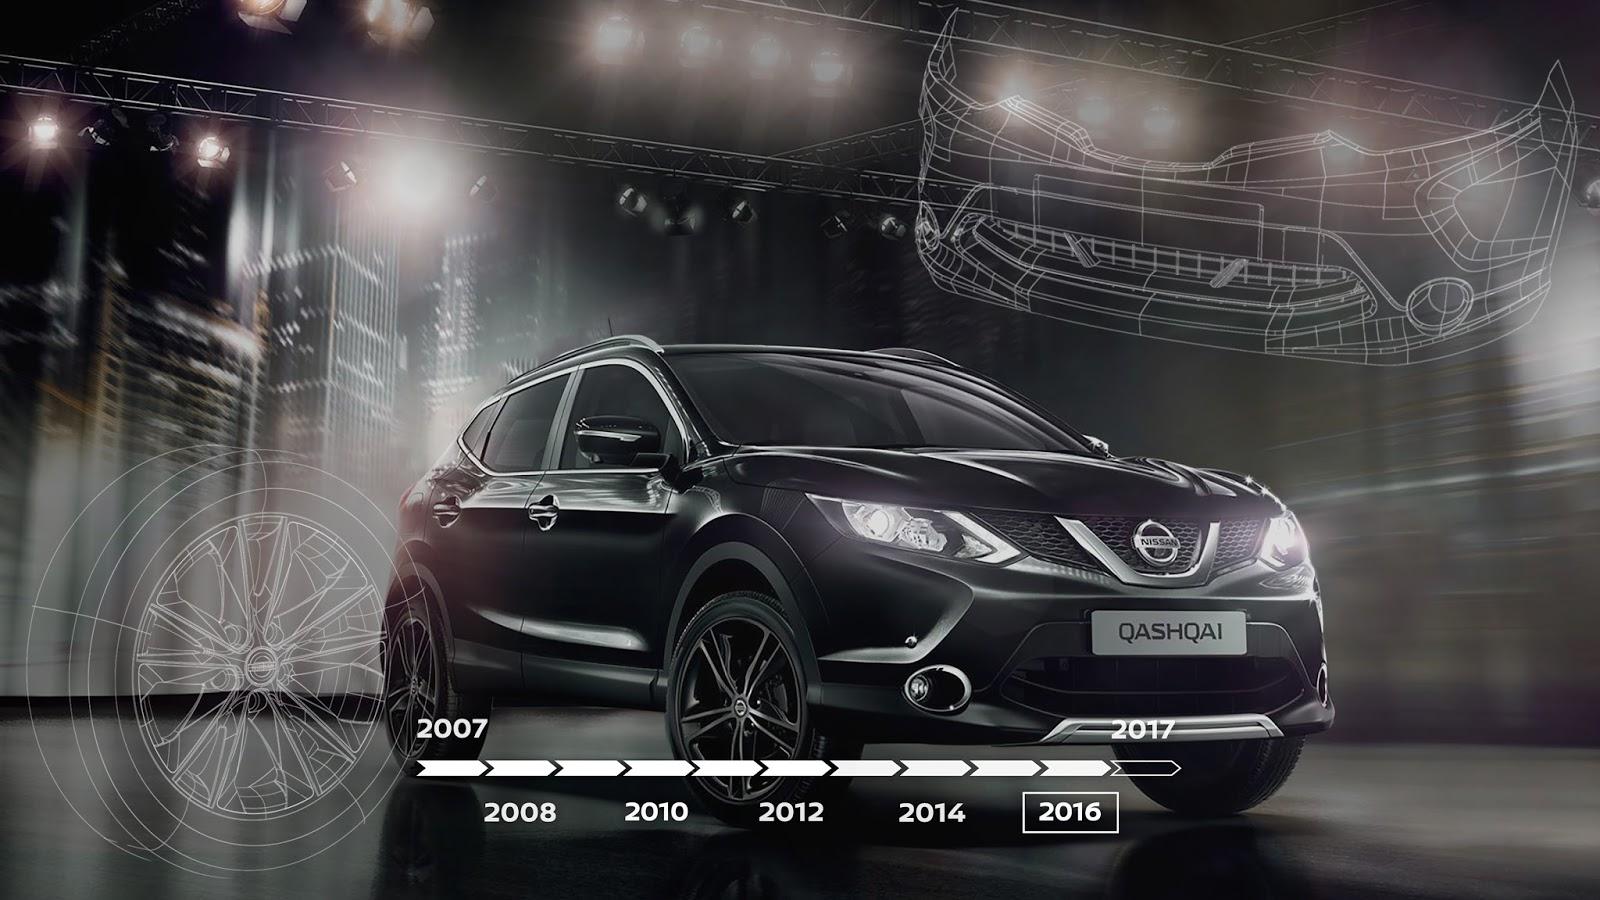 Nissan 1405 To Nissan QASHQAI έγινε 10 χρονών! Crossover, Nissan, Nissan Qashqai, SUV, videos